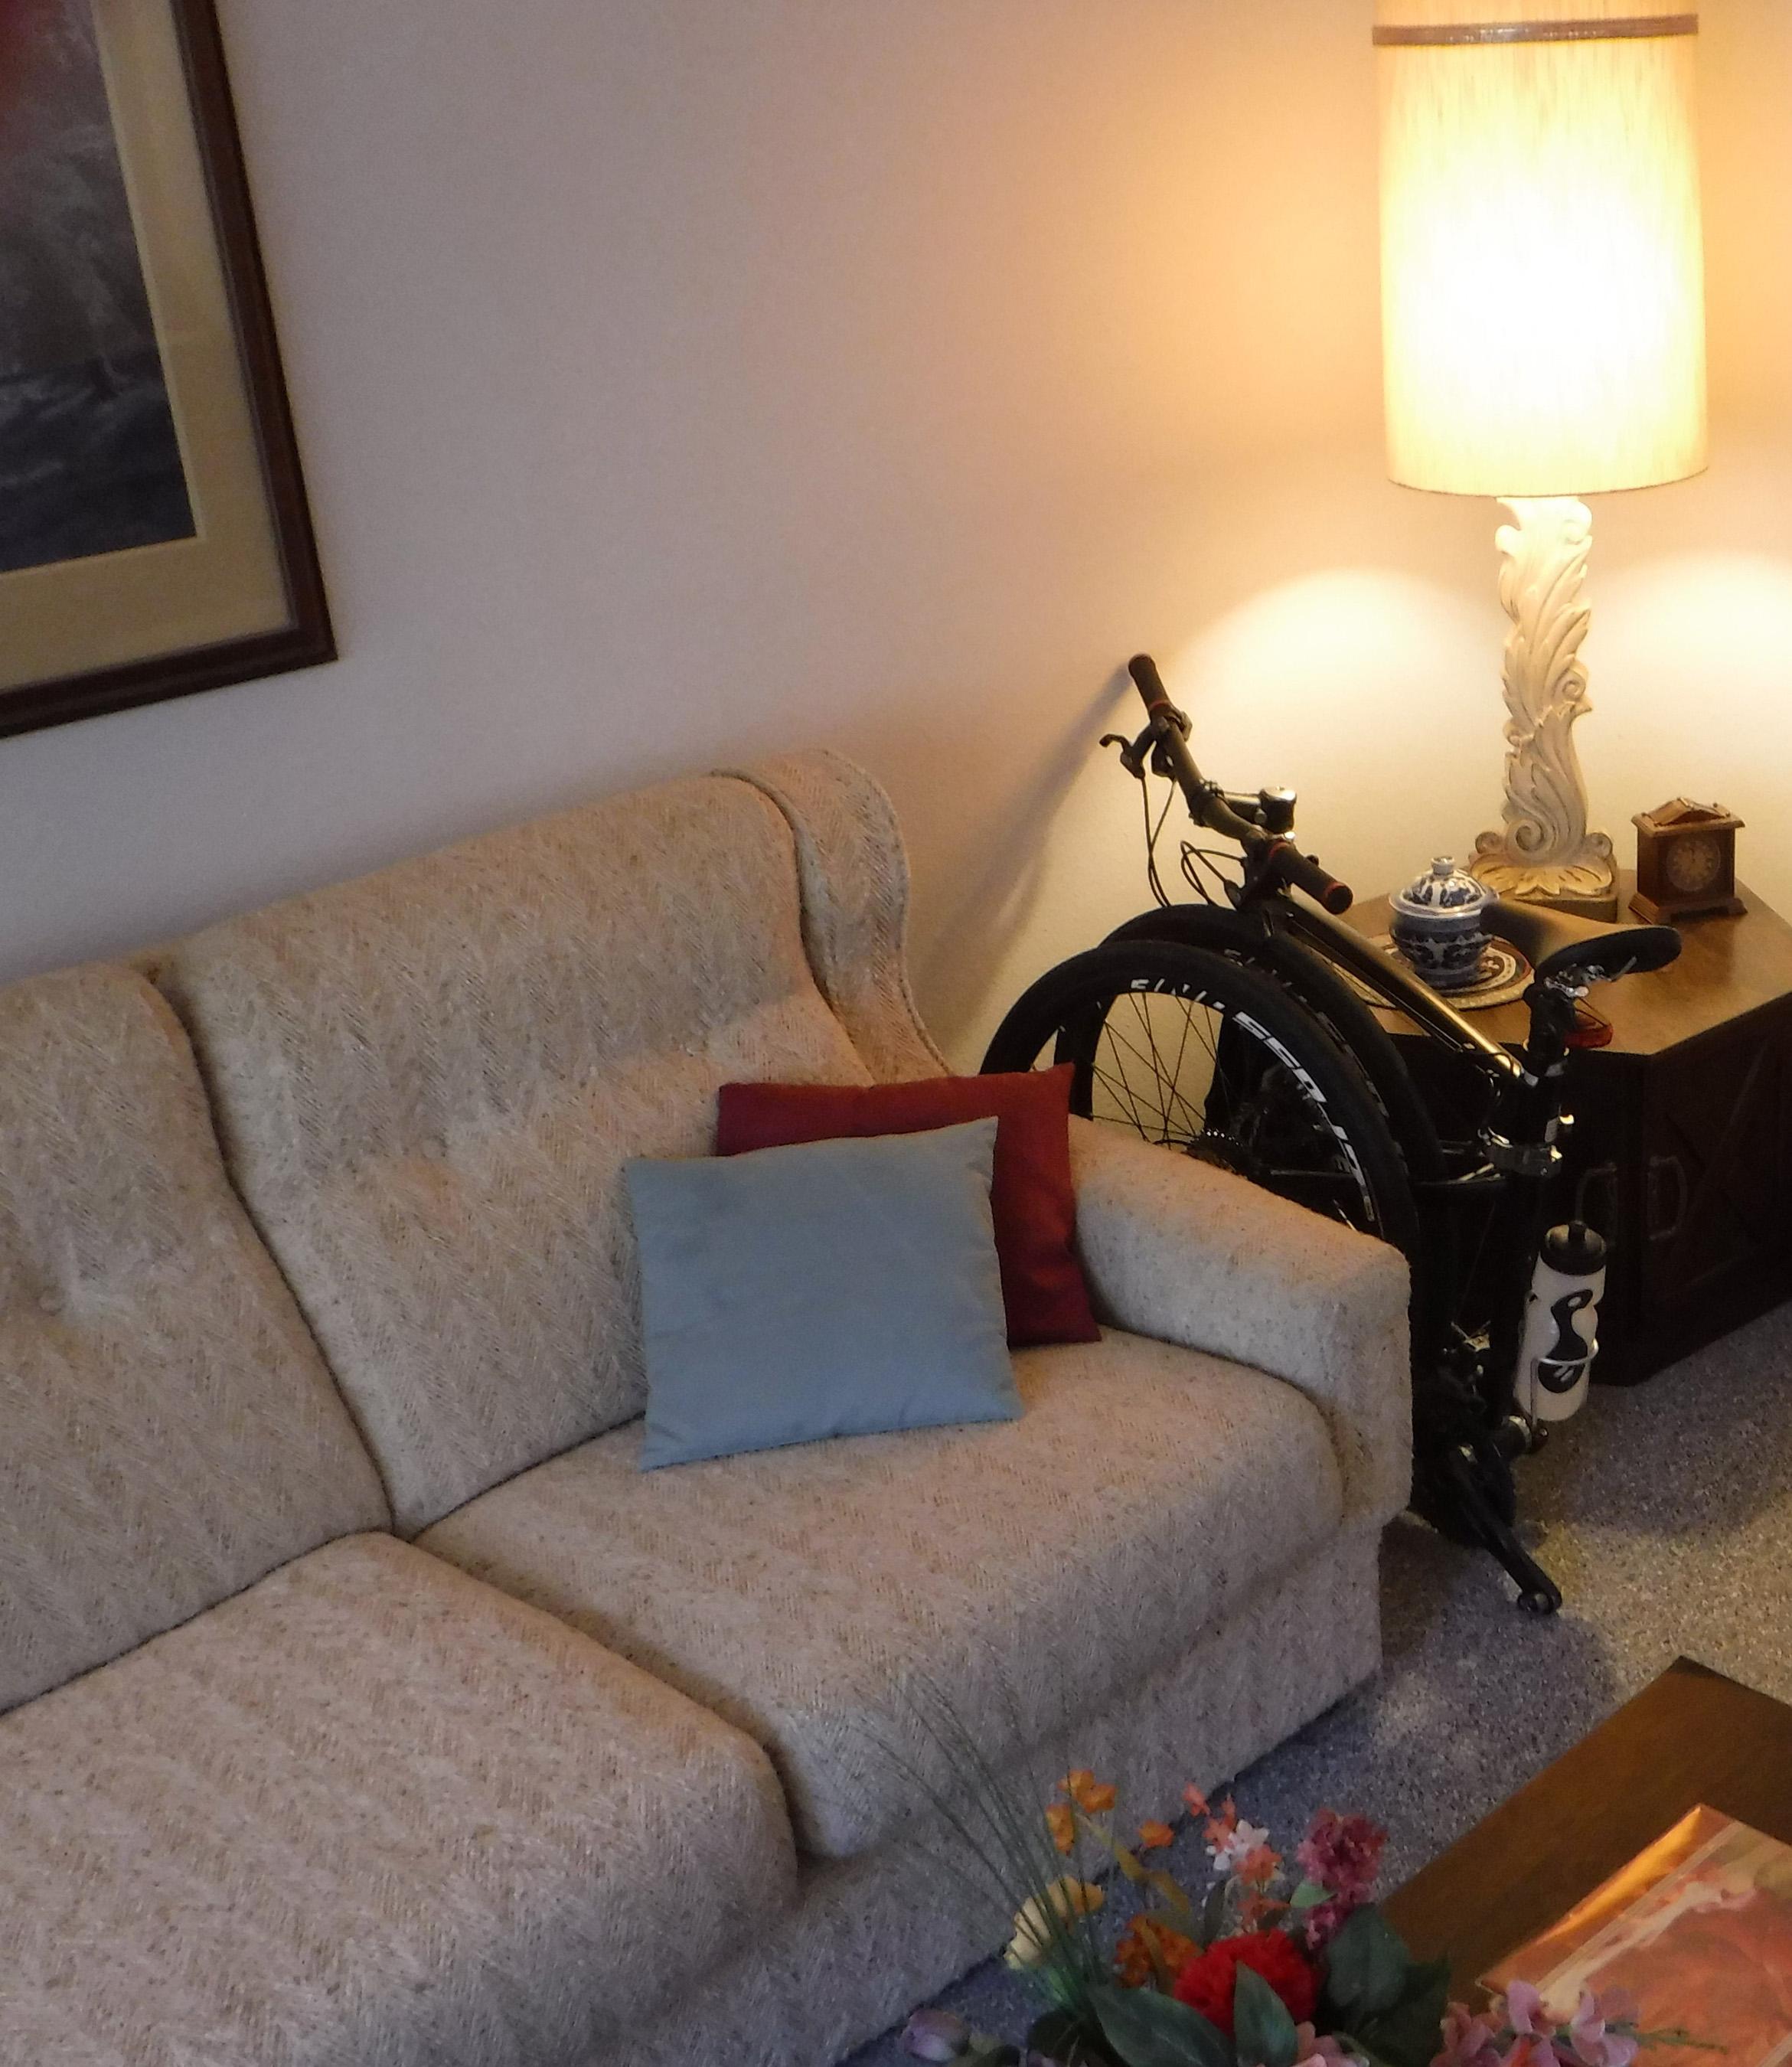 CHANGE bike really fits